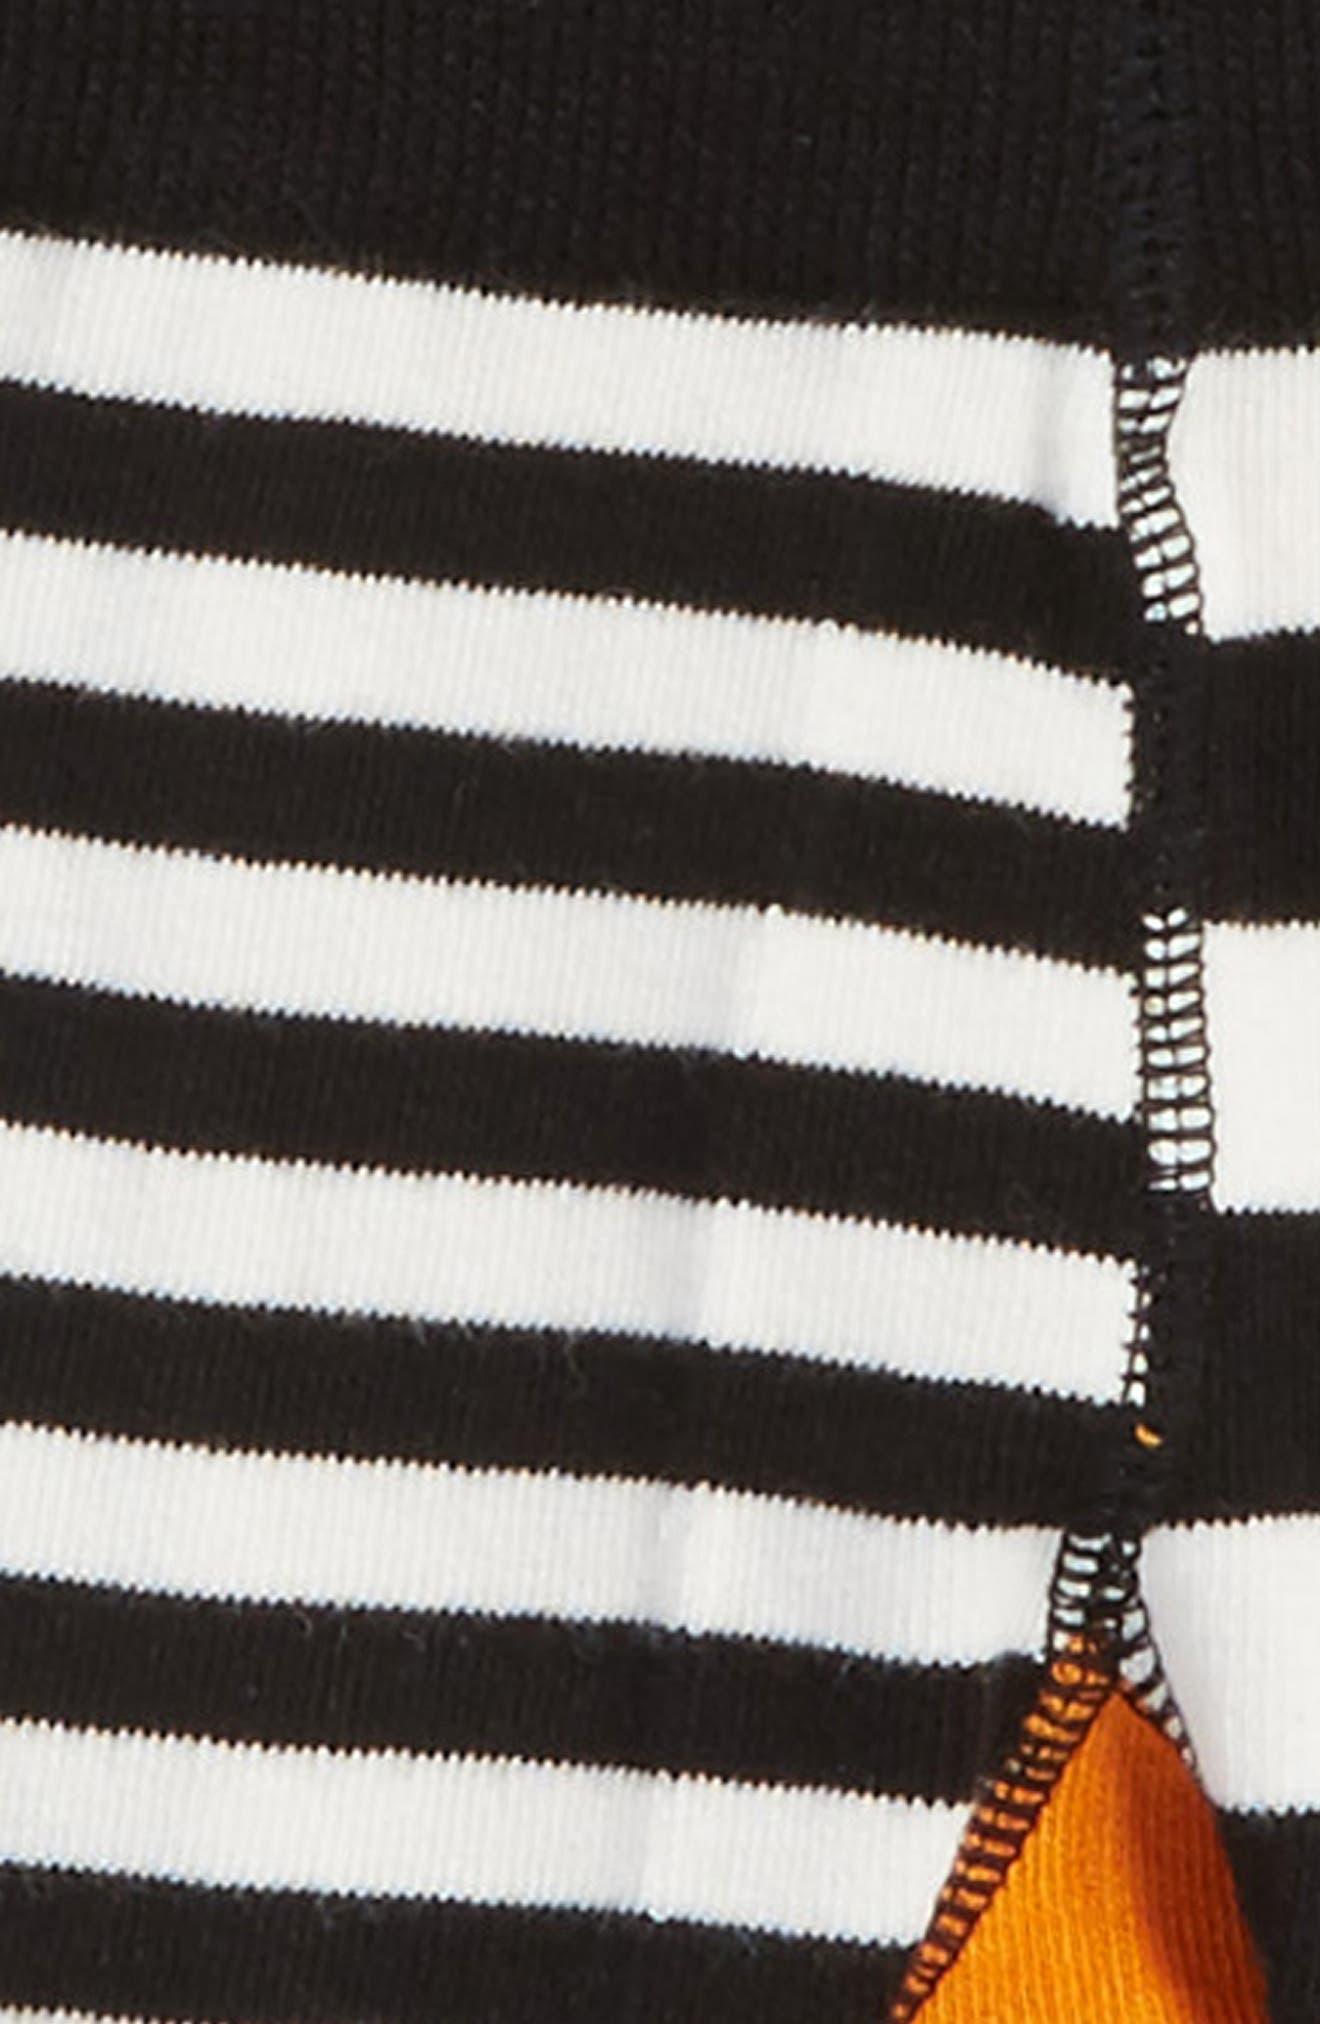 Fox Leggings,                             Alternate thumbnail 3, color,                             Orange/ Black/ Cream